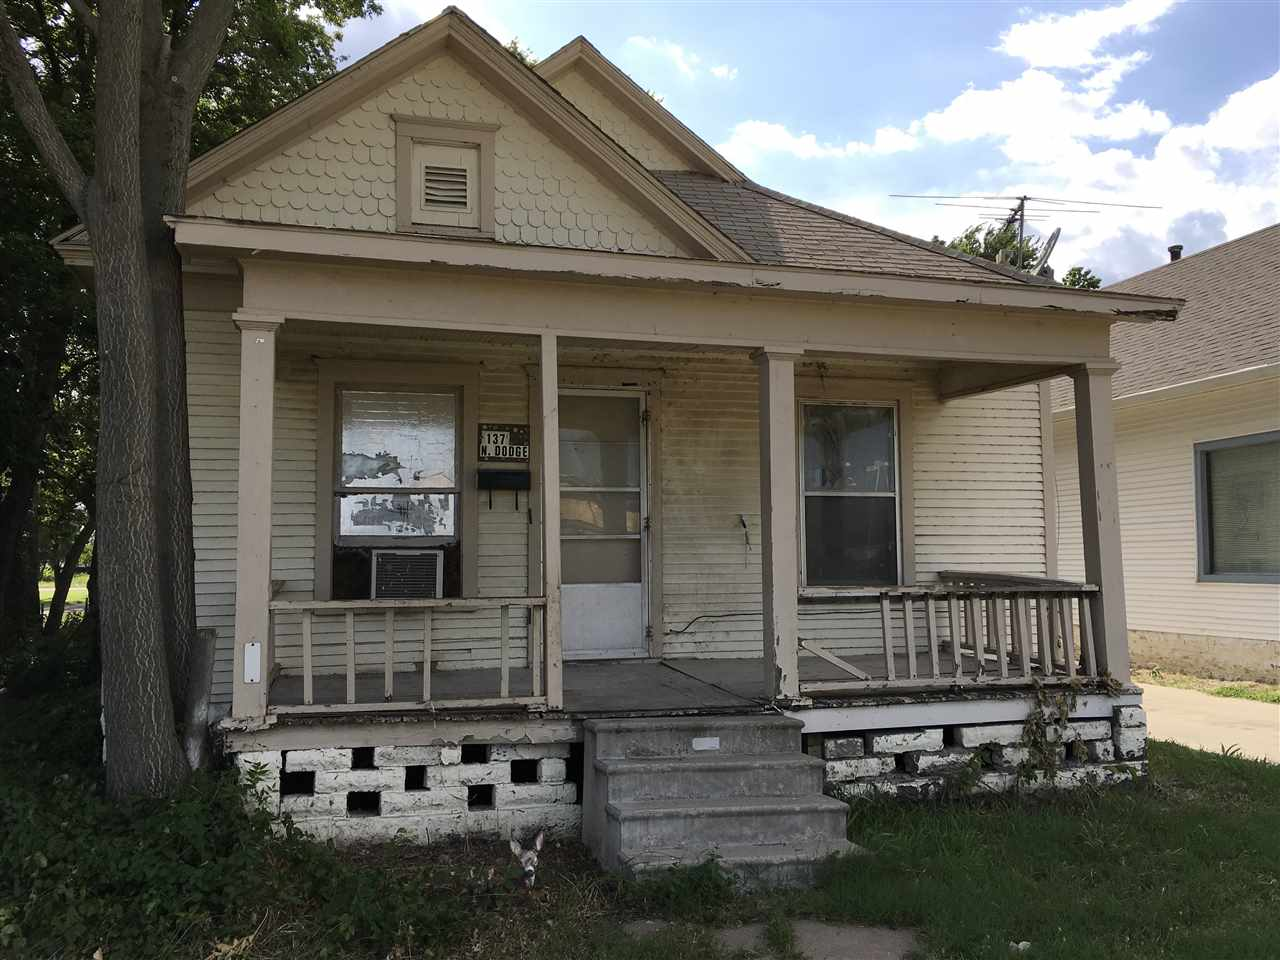 137 N Dodge, Wichita, KS 67211